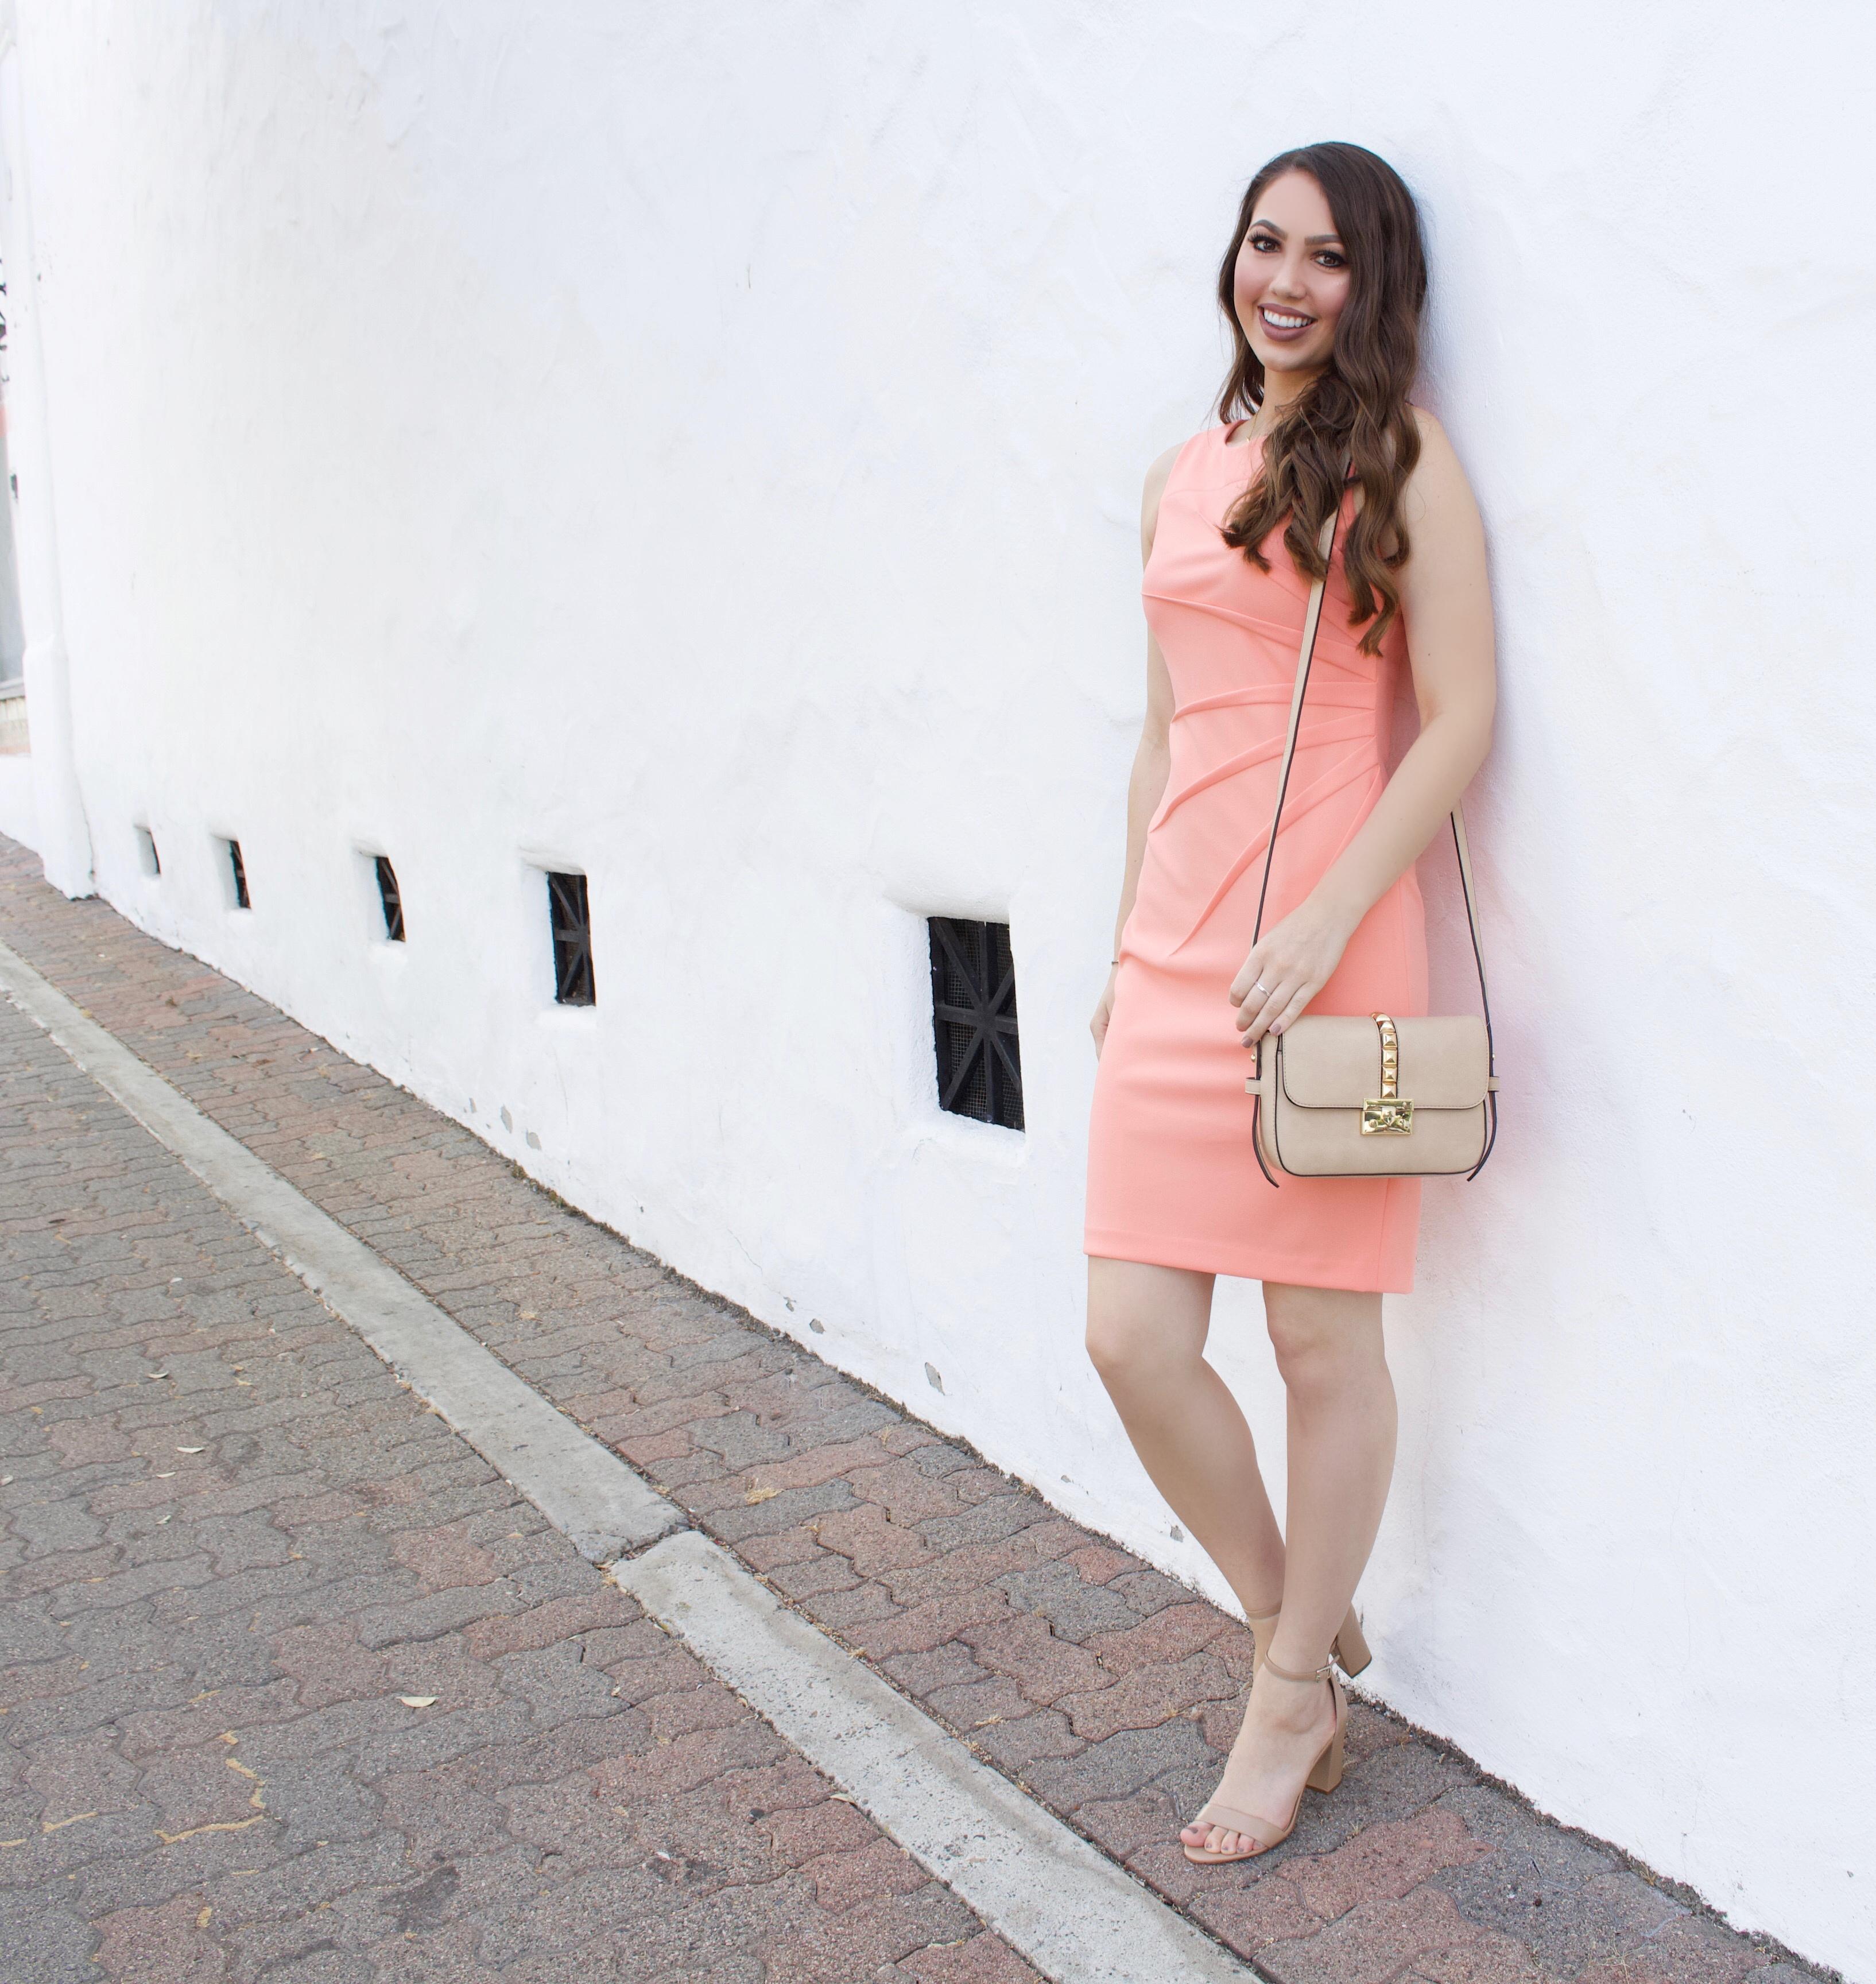 macy's dresses calvin klein